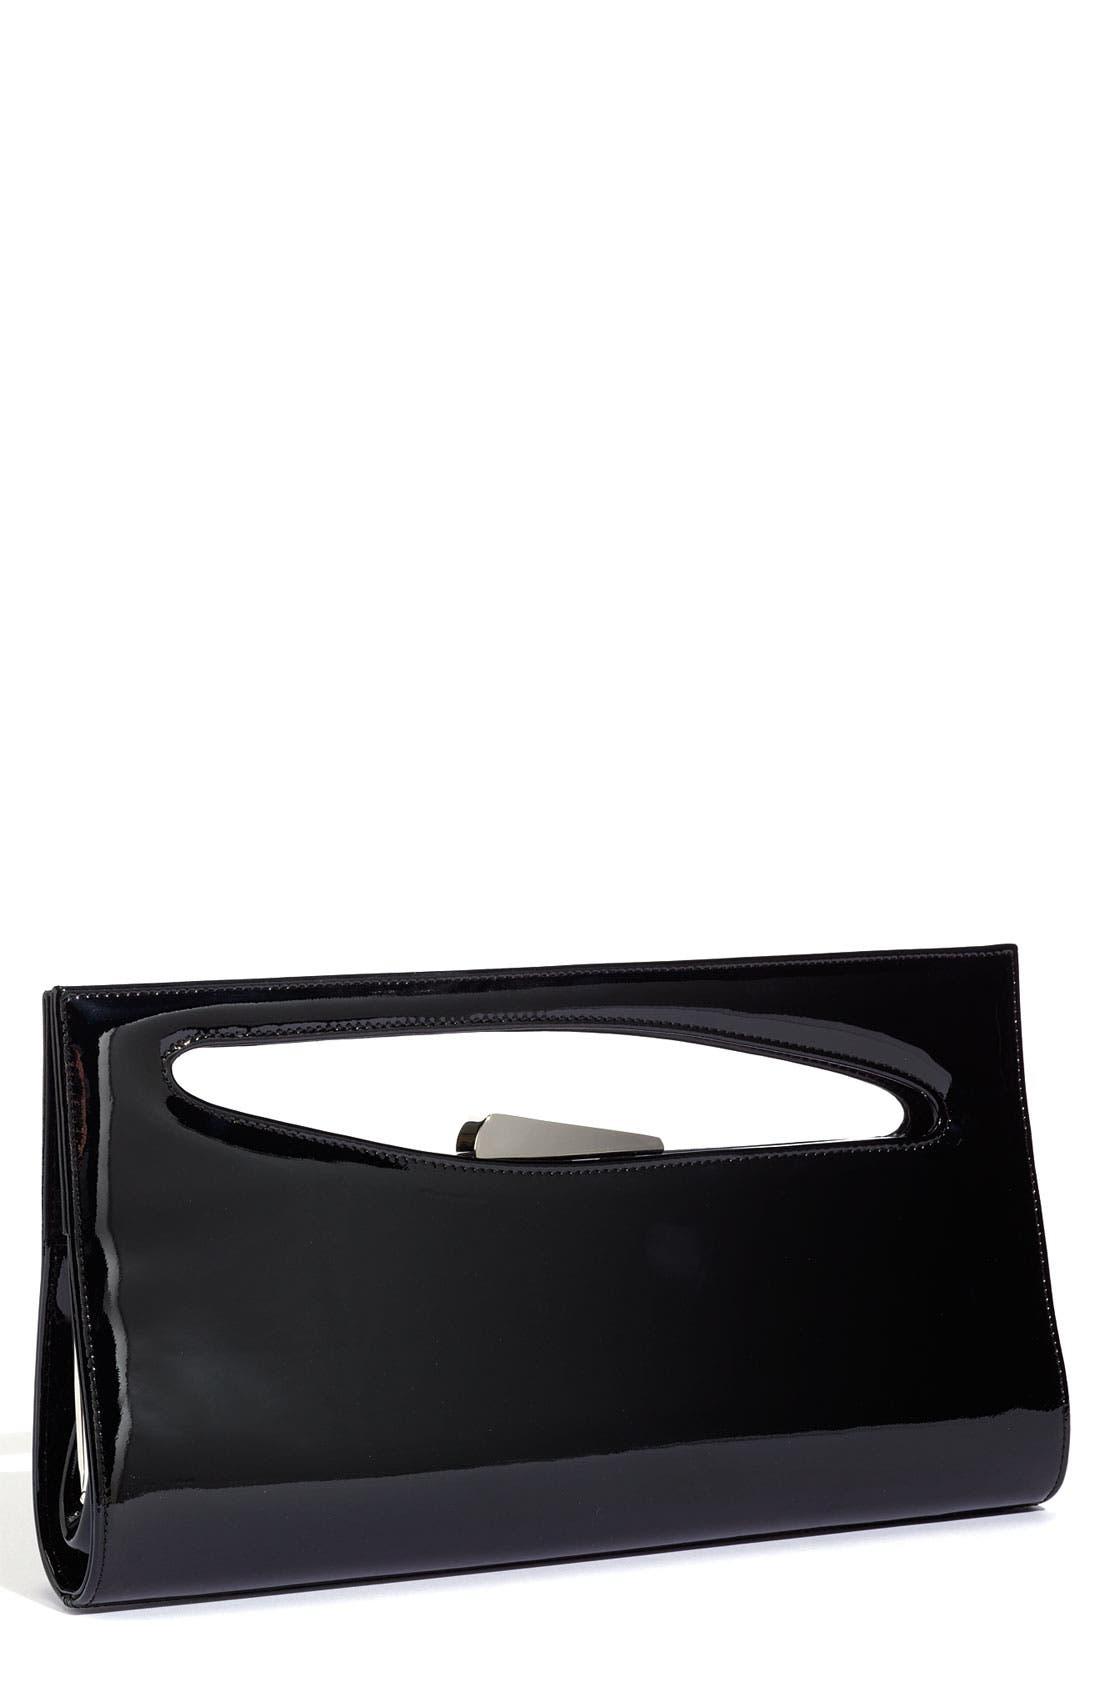 STUART WEITZMAN 'Grip' Handbag, Main, color, 002